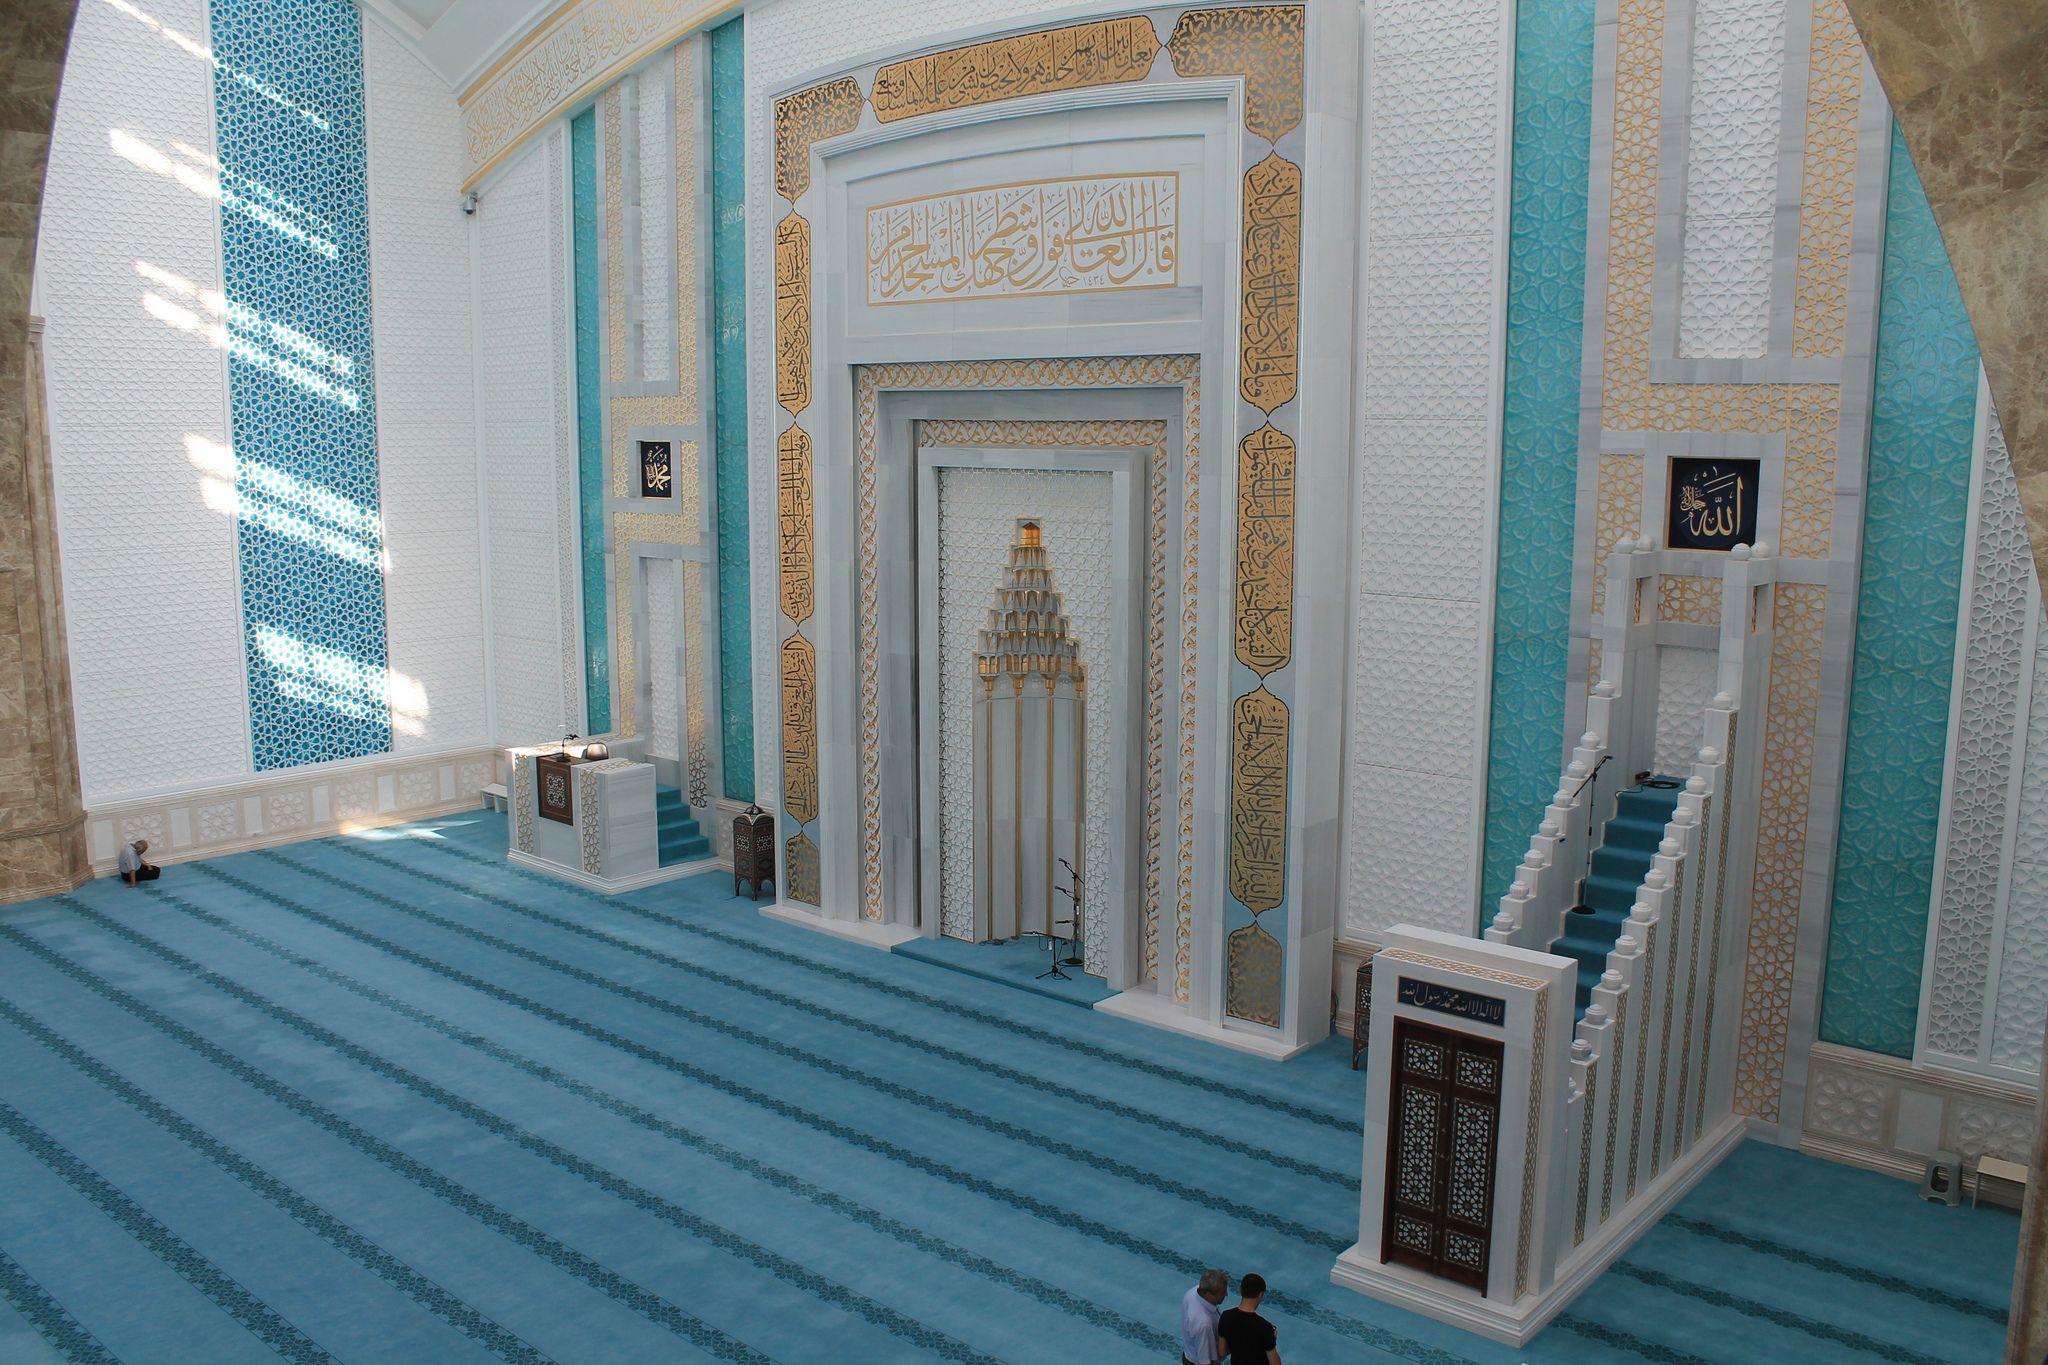 https://flic.kr/p/ntEuS8 | ANKARA | Ahmet Hamdi Akseki Camii